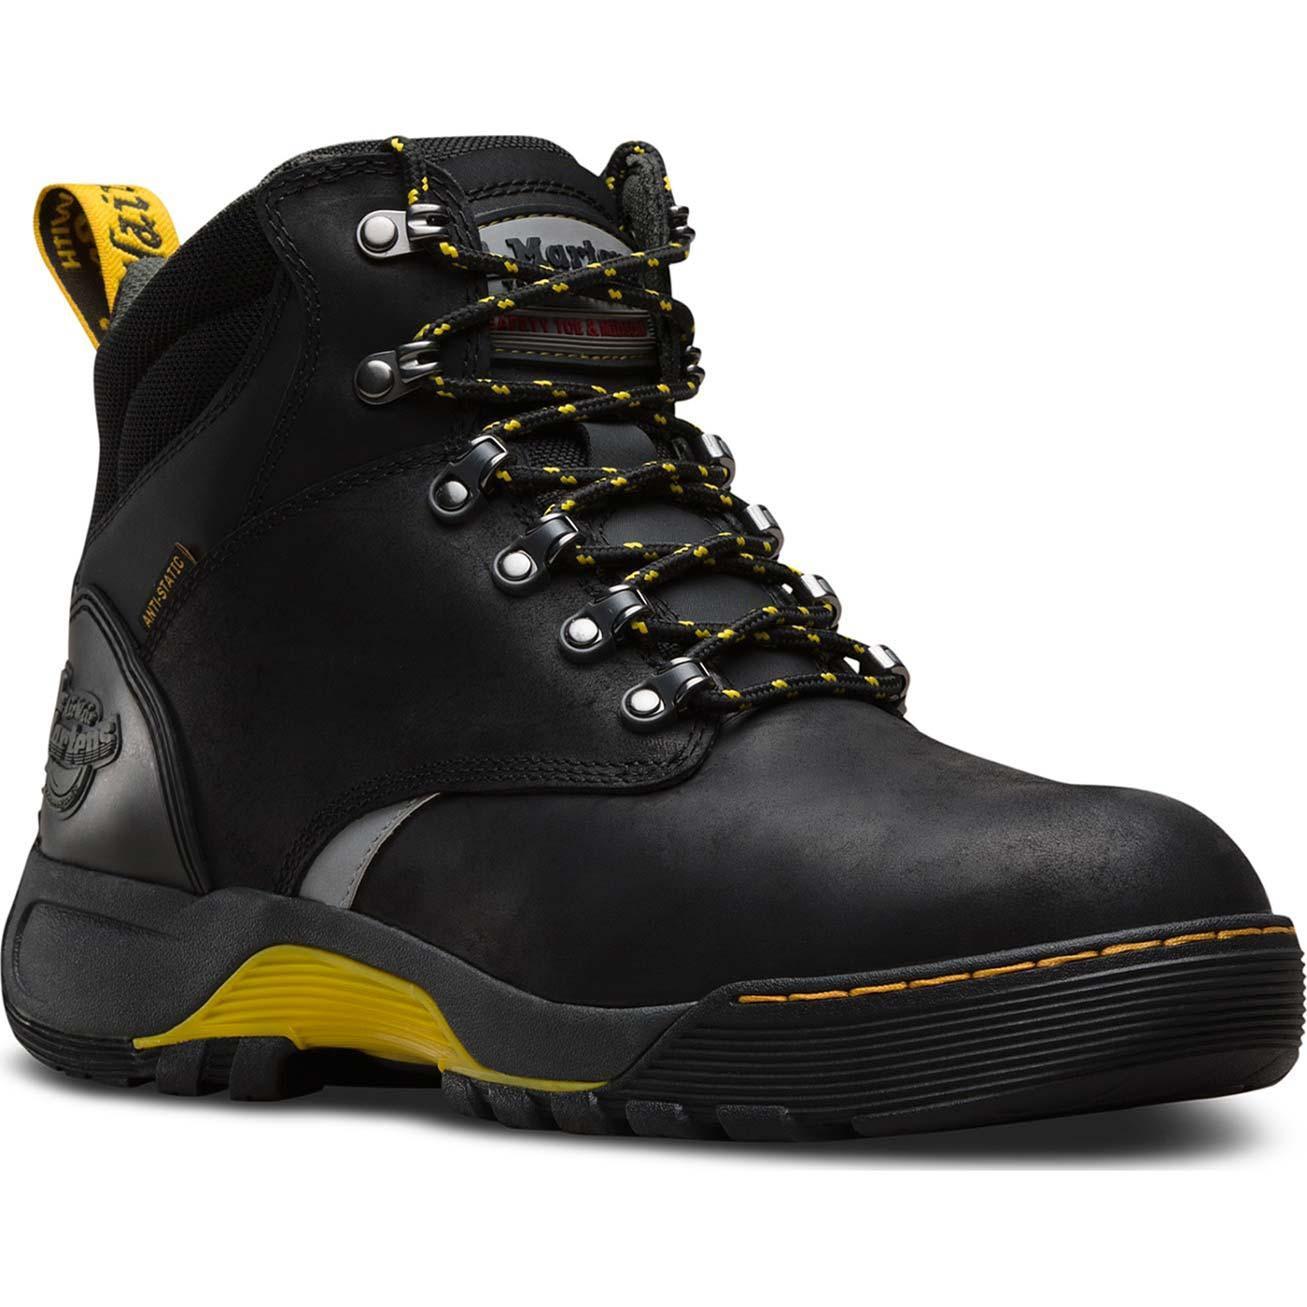 c47dae98f7 Dr. Martens Ridge Unisex Steel Toe Puncture-Resistant Static-Dissipative  Slip-Resistant Work HikerDr. Martens Ridge Unisex Steel Toe  Puncture-Resistant ...